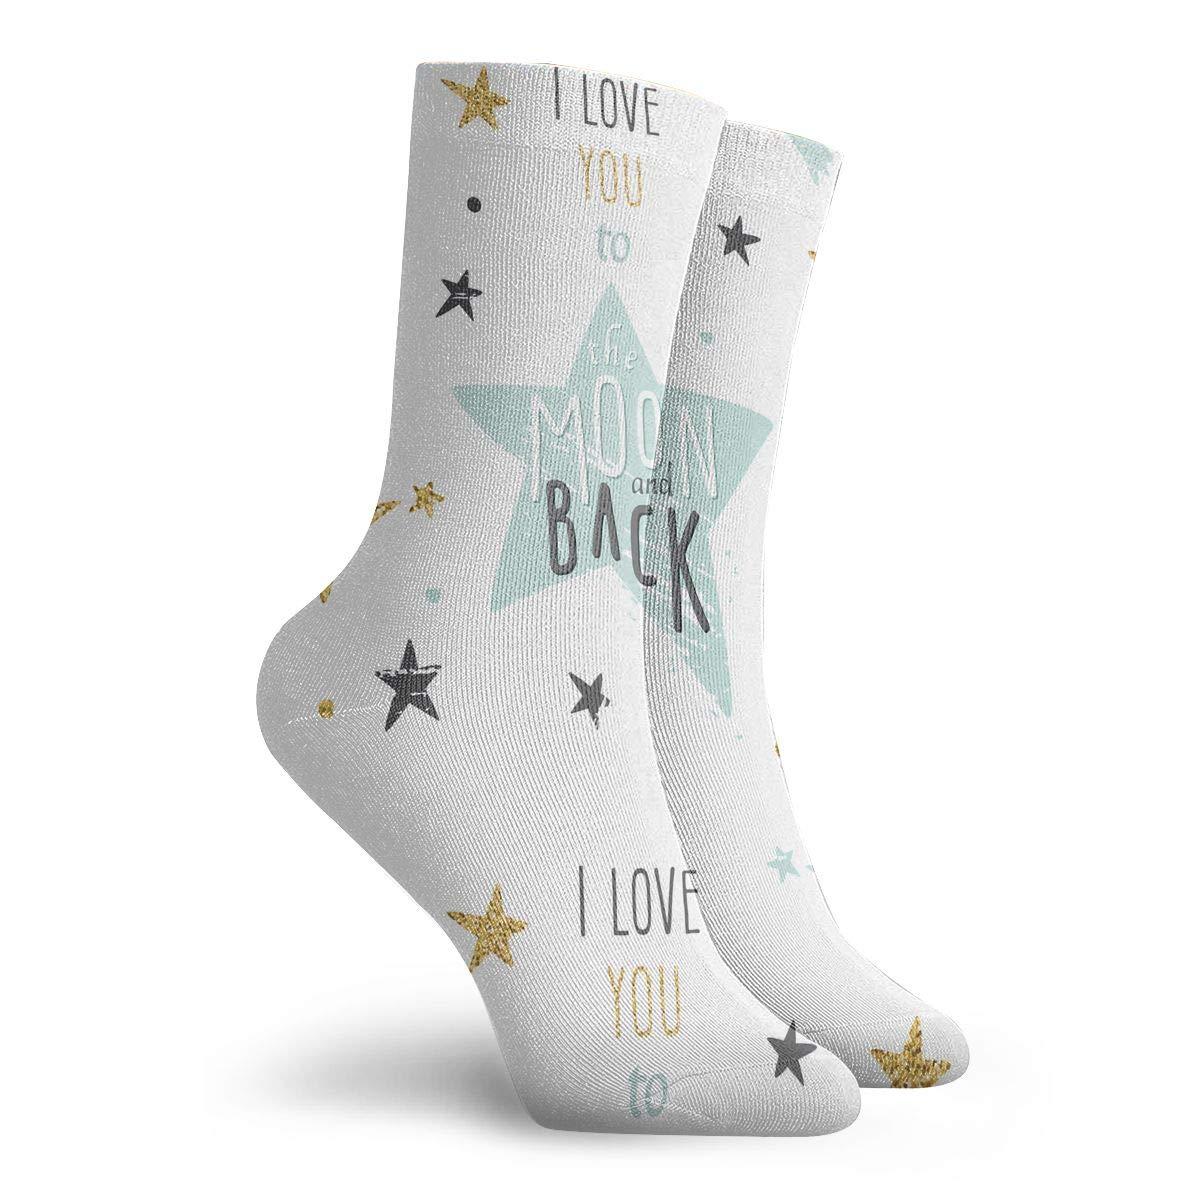 Inspiration And Motivation Romance And Love Fashion Dress Socks Short Socks Leisure Travel 11.8 Inch